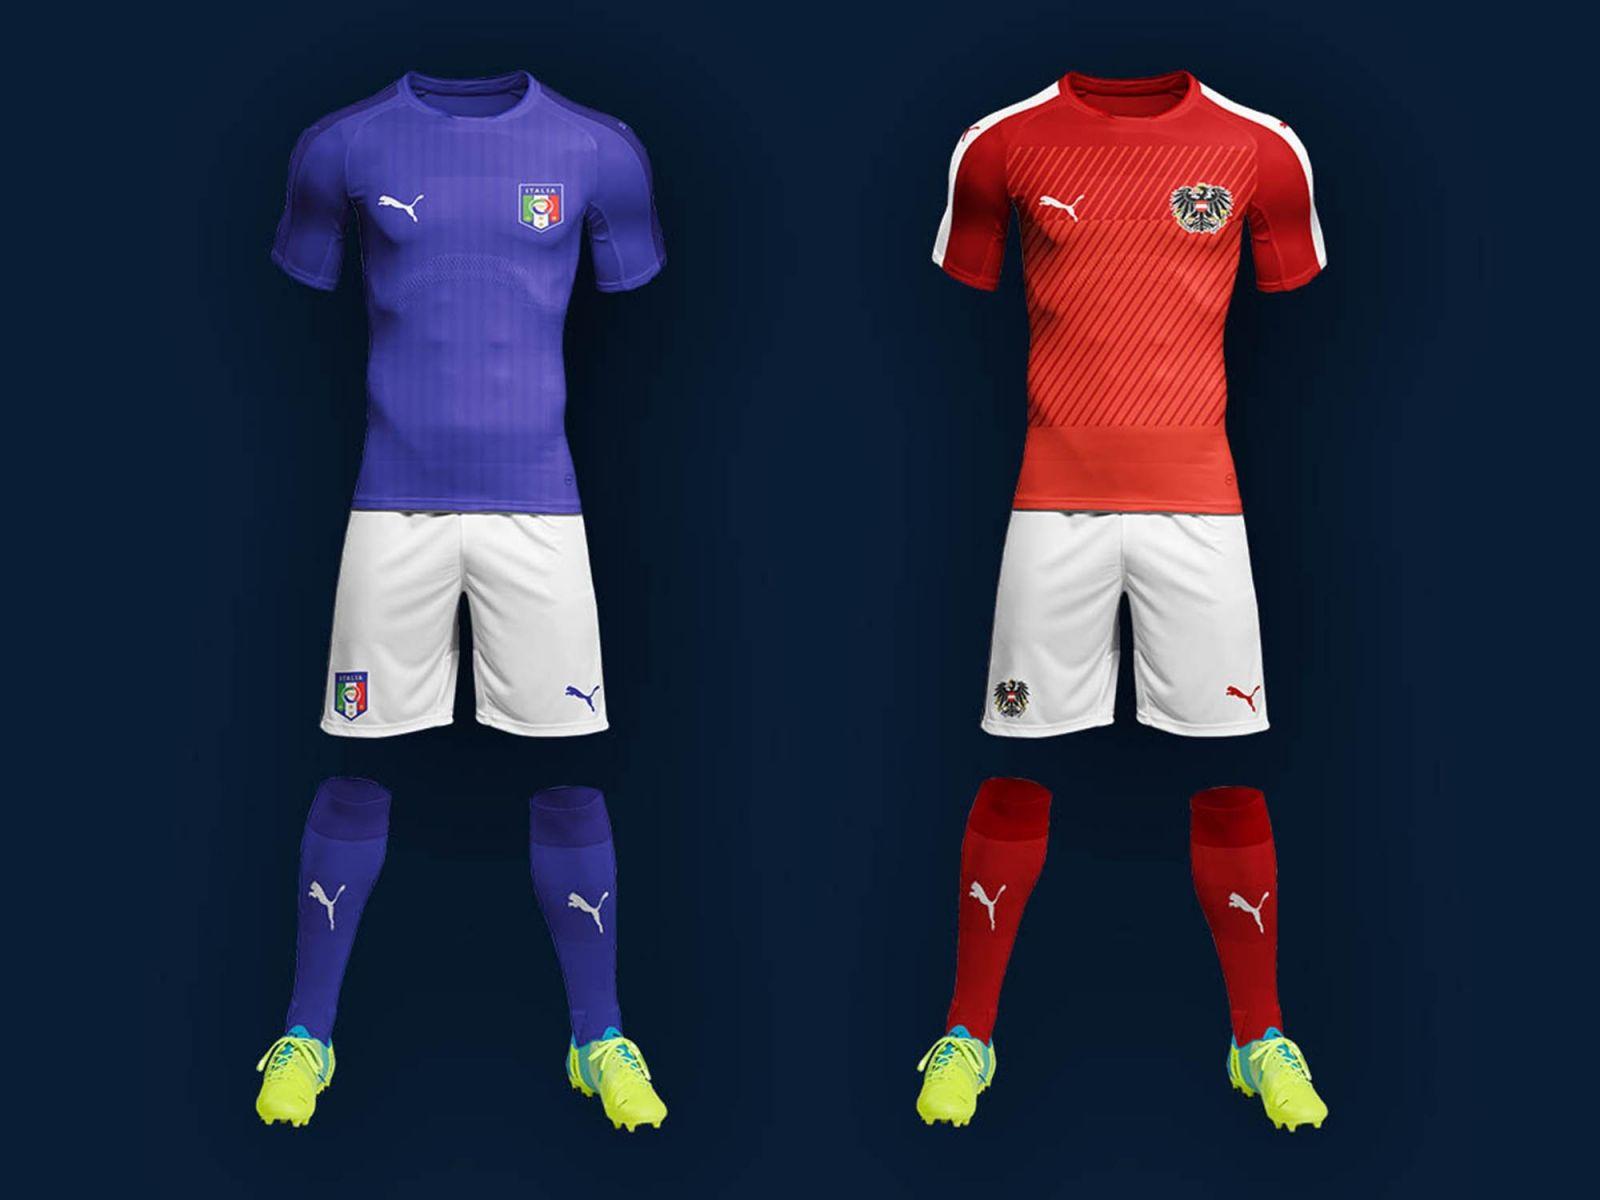 Ache e baixe recursos grátis para uniforme futebol. Soccer Football Mockup Mockup Free Psd Clothing Mockup Soccer Kits